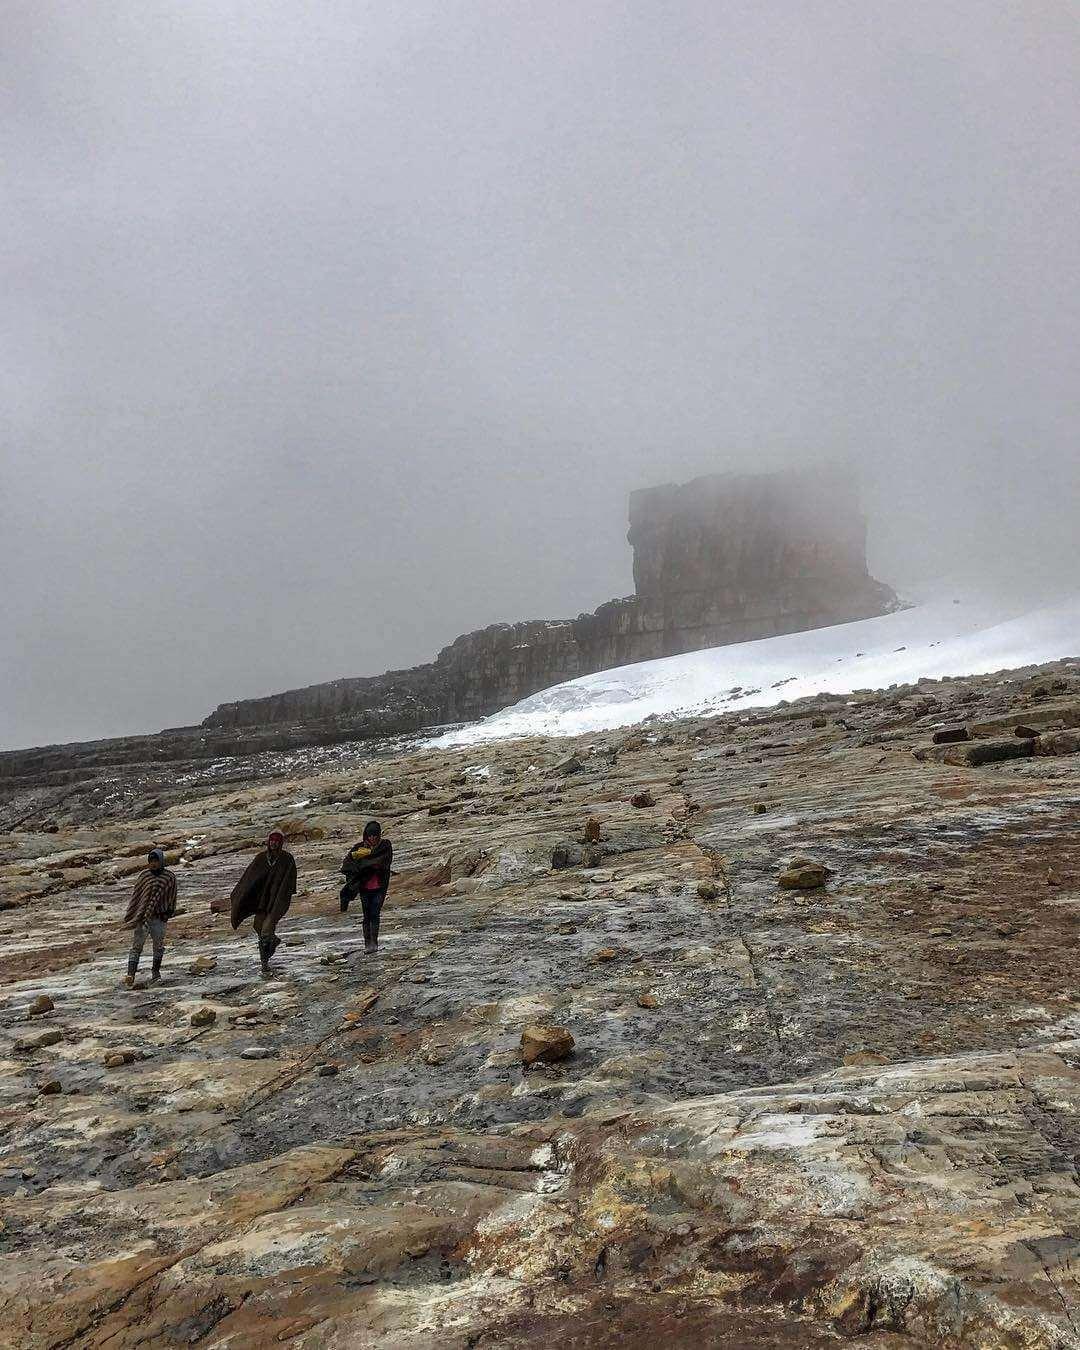 Trekking and hiking in Boyacá